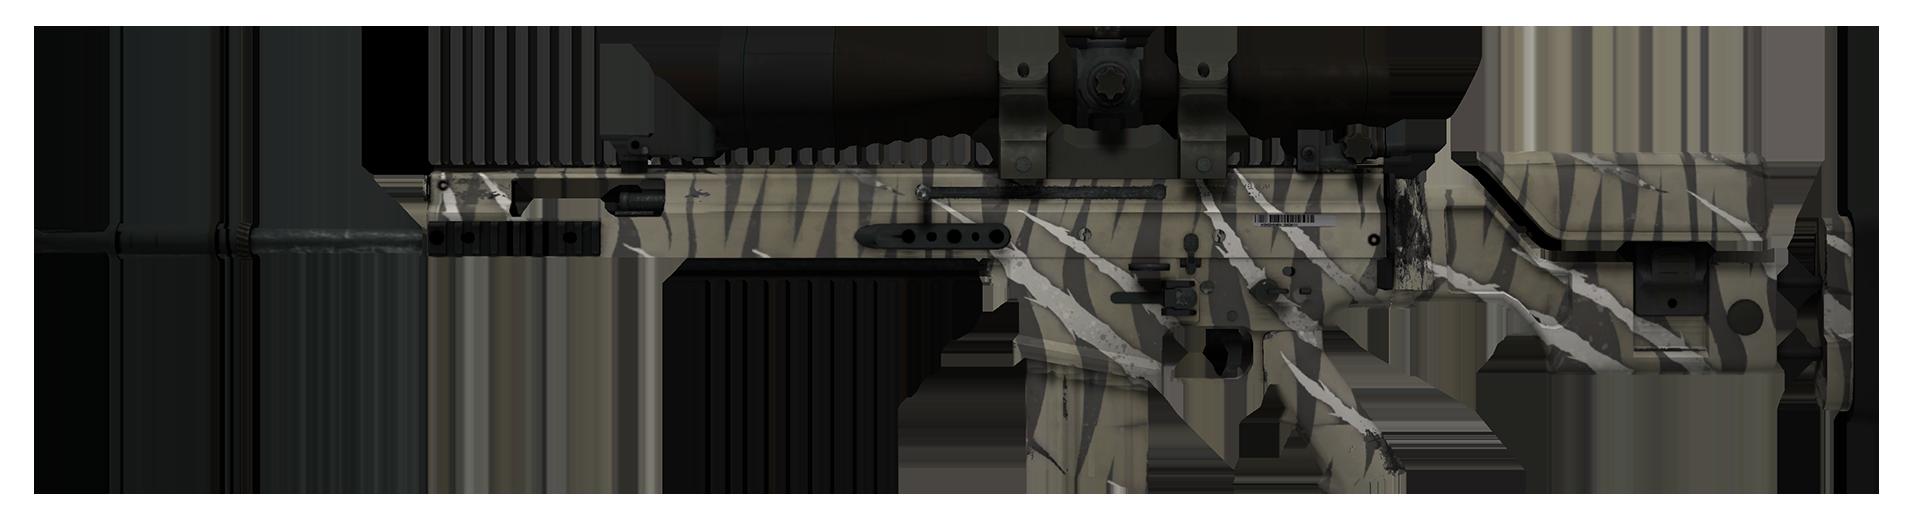 SCAR-20 Torn Large Rendering